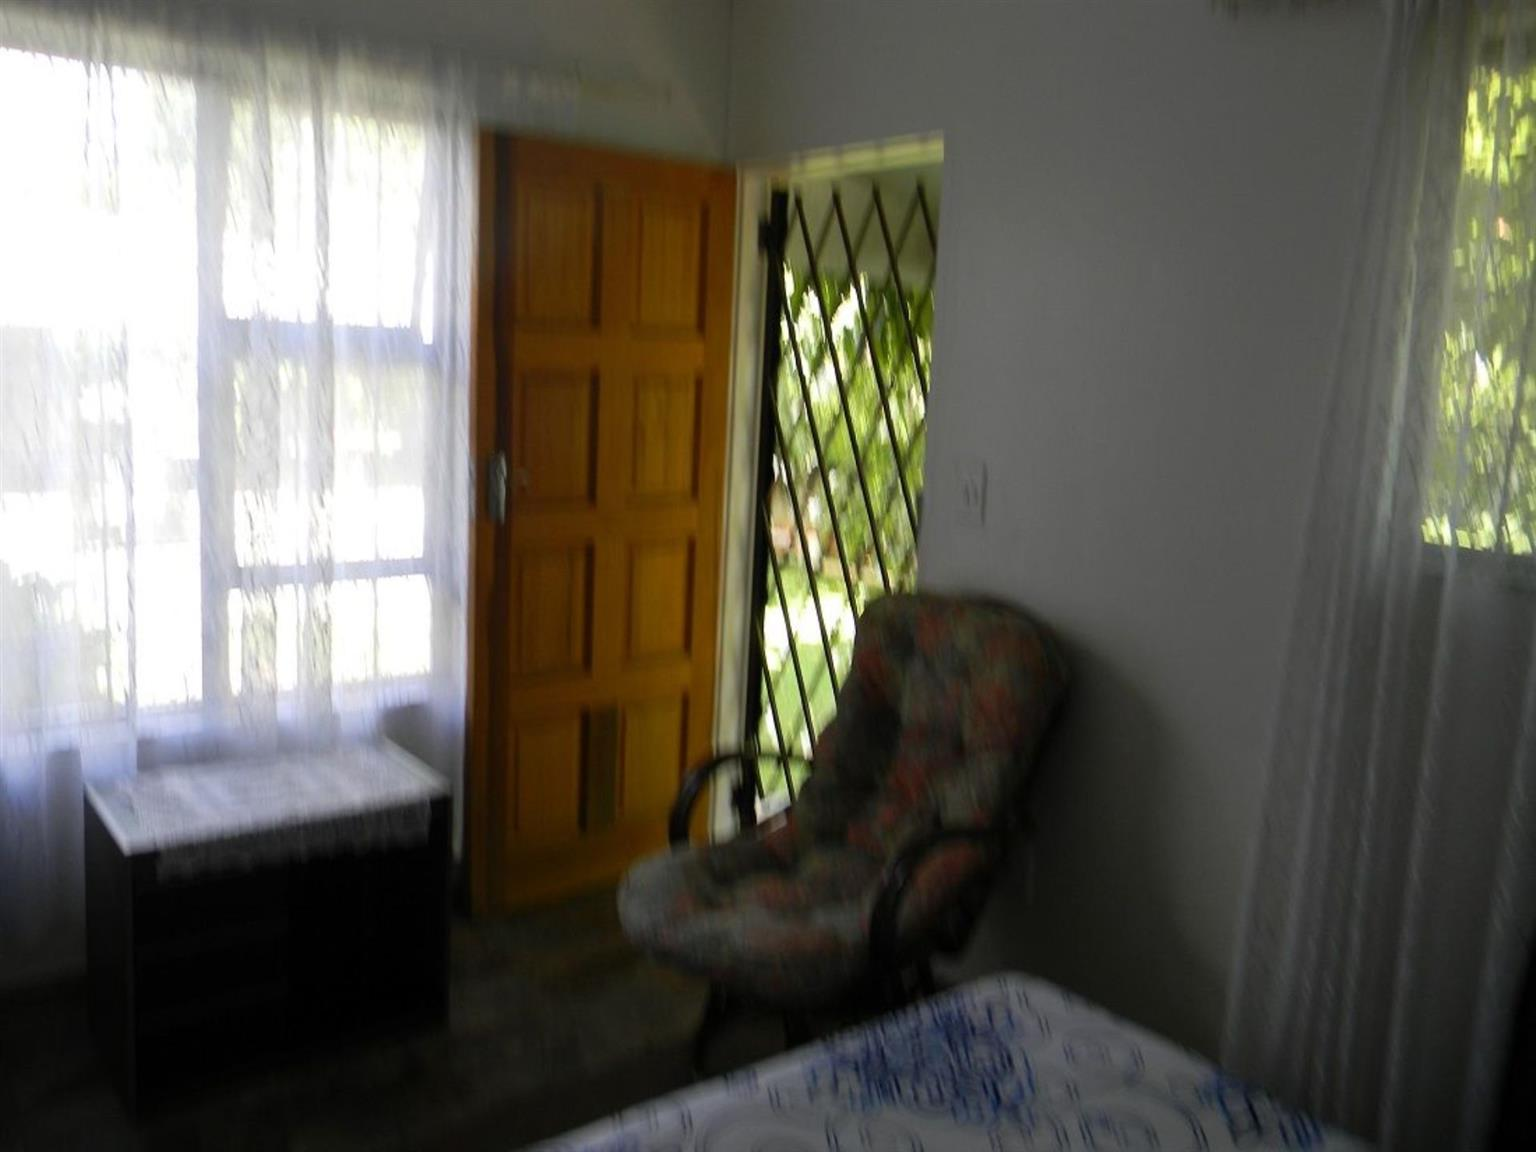 Apartment Rental Monthly in HURLINGHAM MANOR